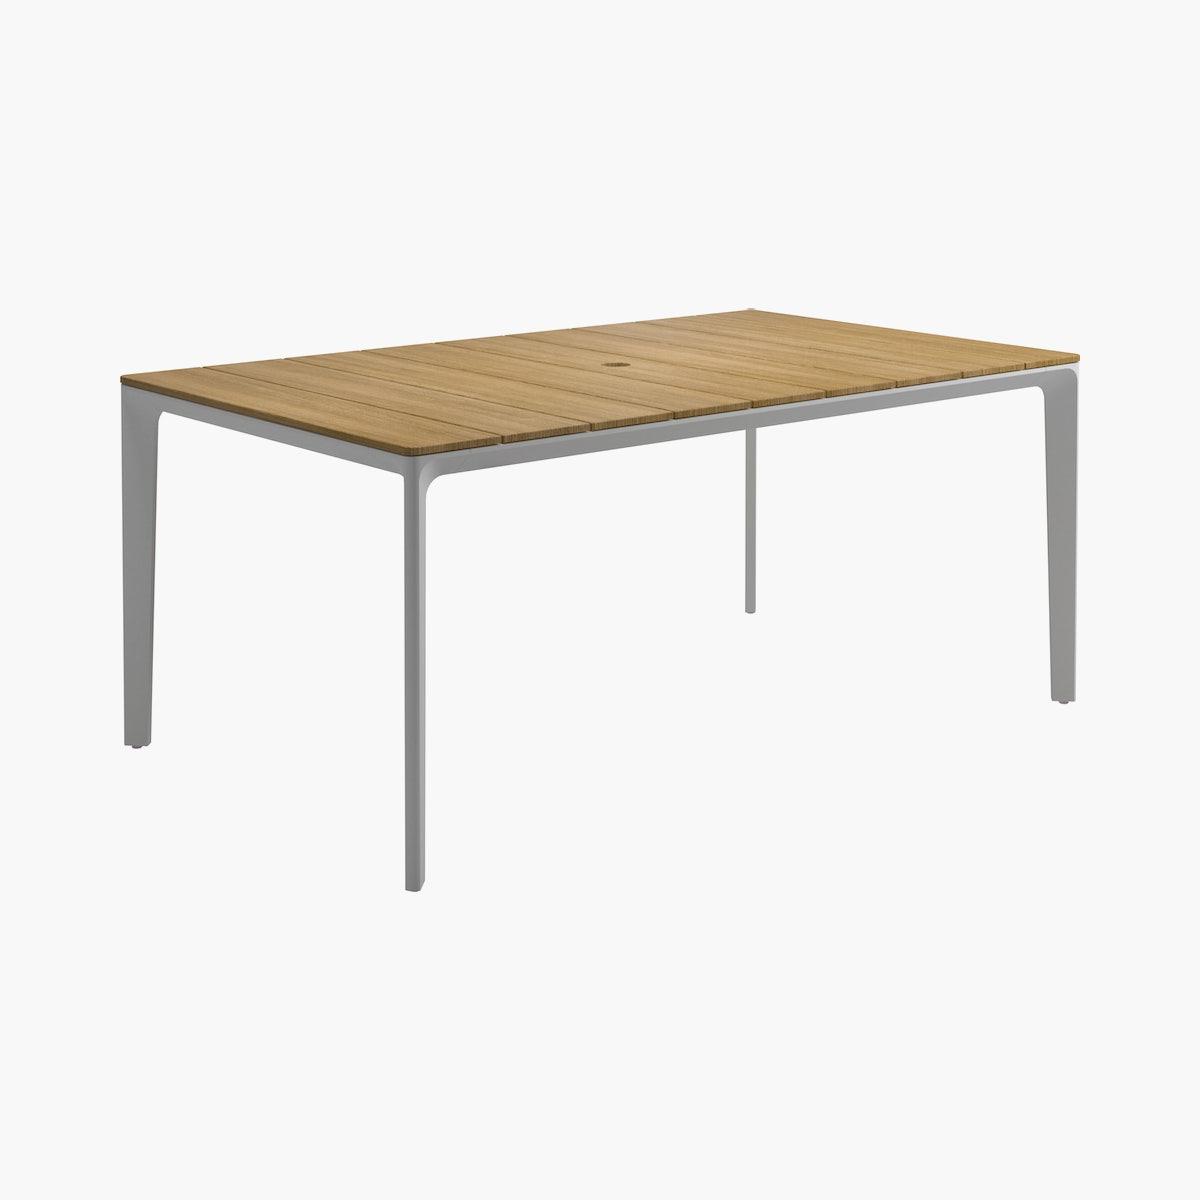 Carver Dining Table, Rectangular